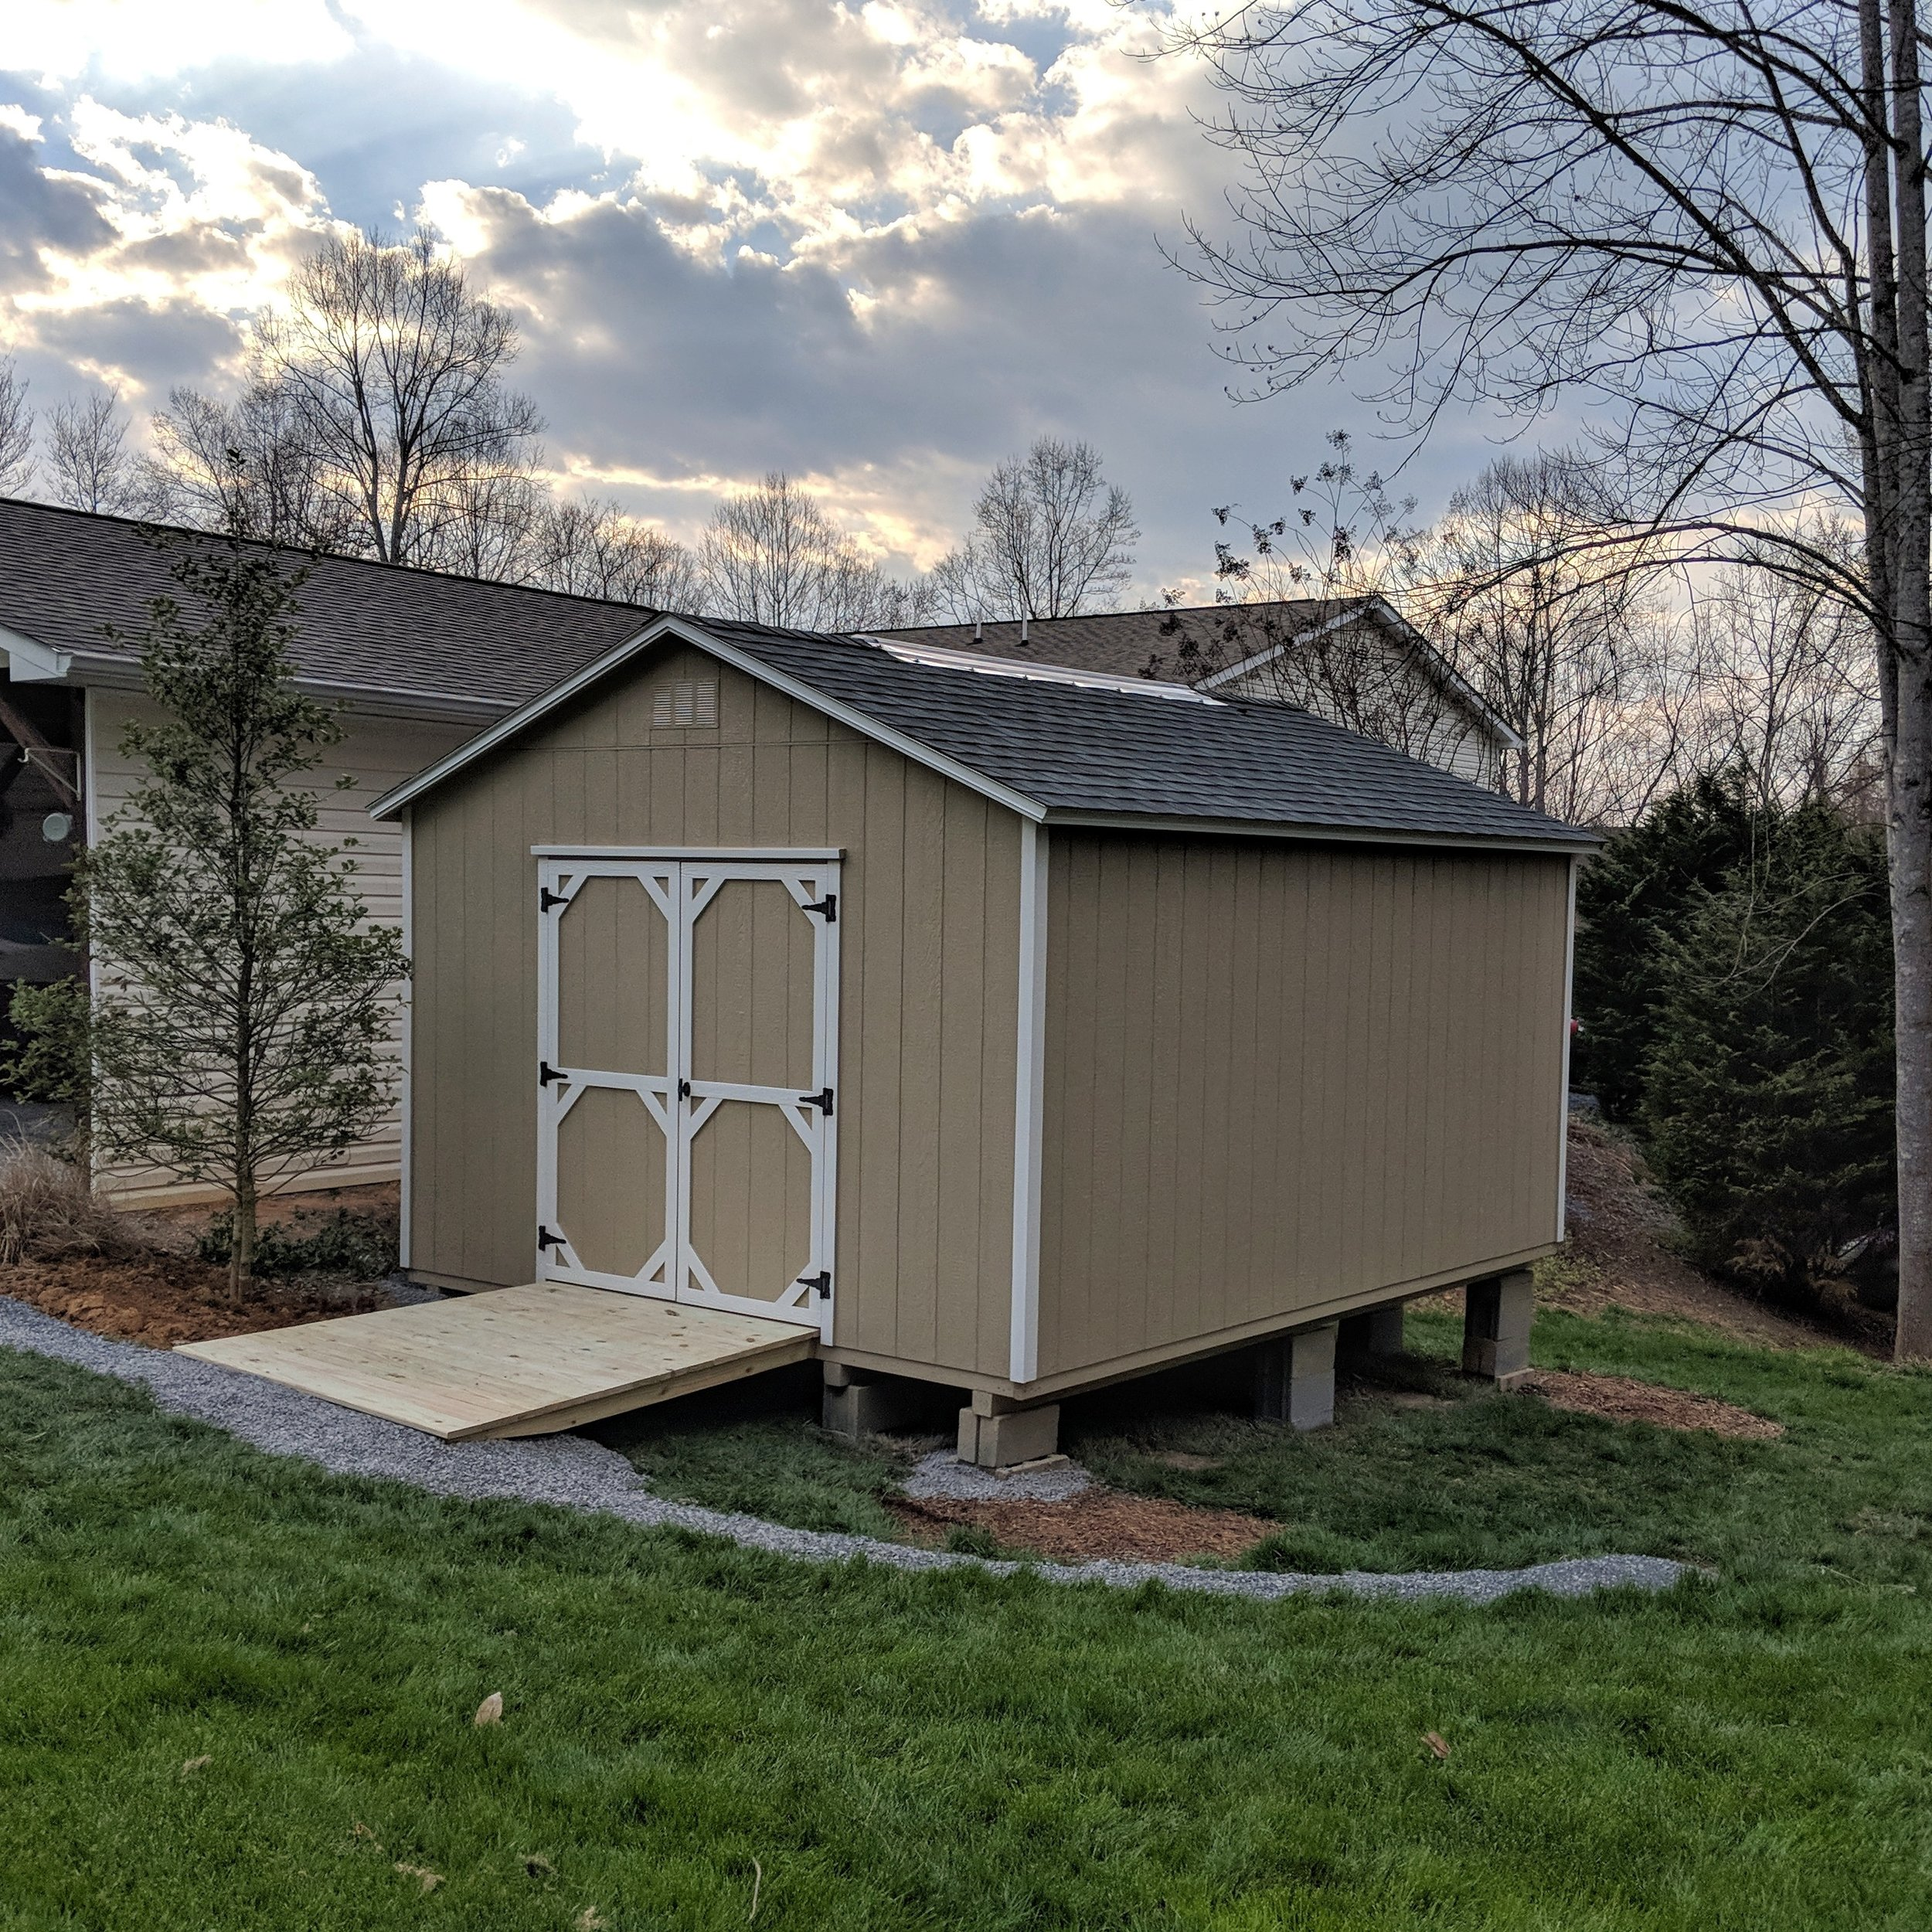 12' x 16' Cottage